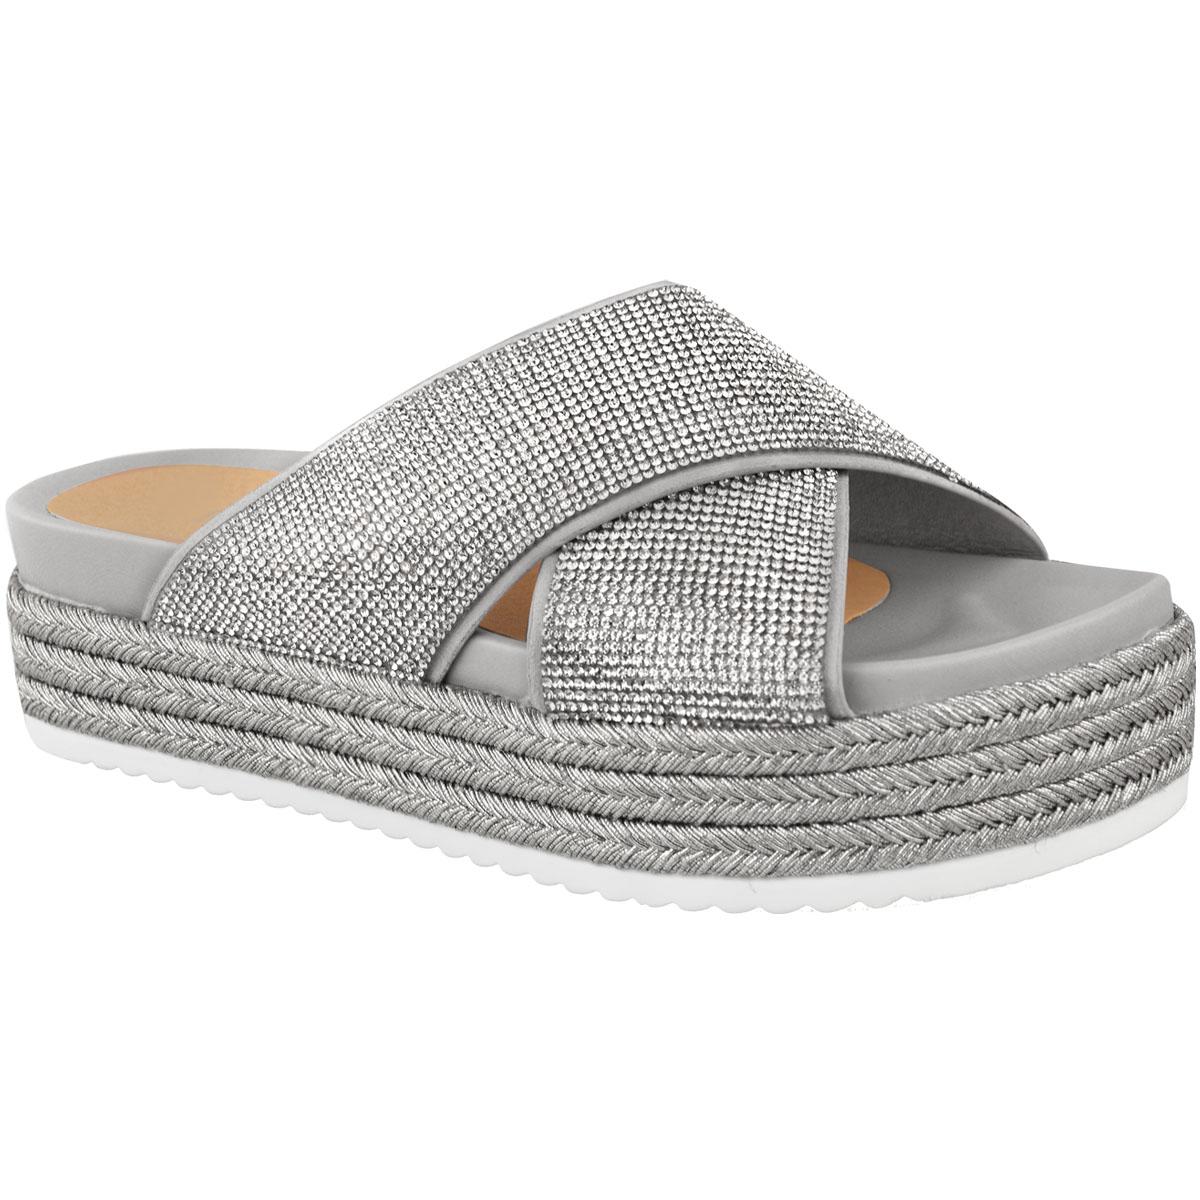 Womens-Ladies-Diamante-Slip-On-Sandals-Flatforms-Sparkly-Platform-Summer-Size-UK thumbnail 13